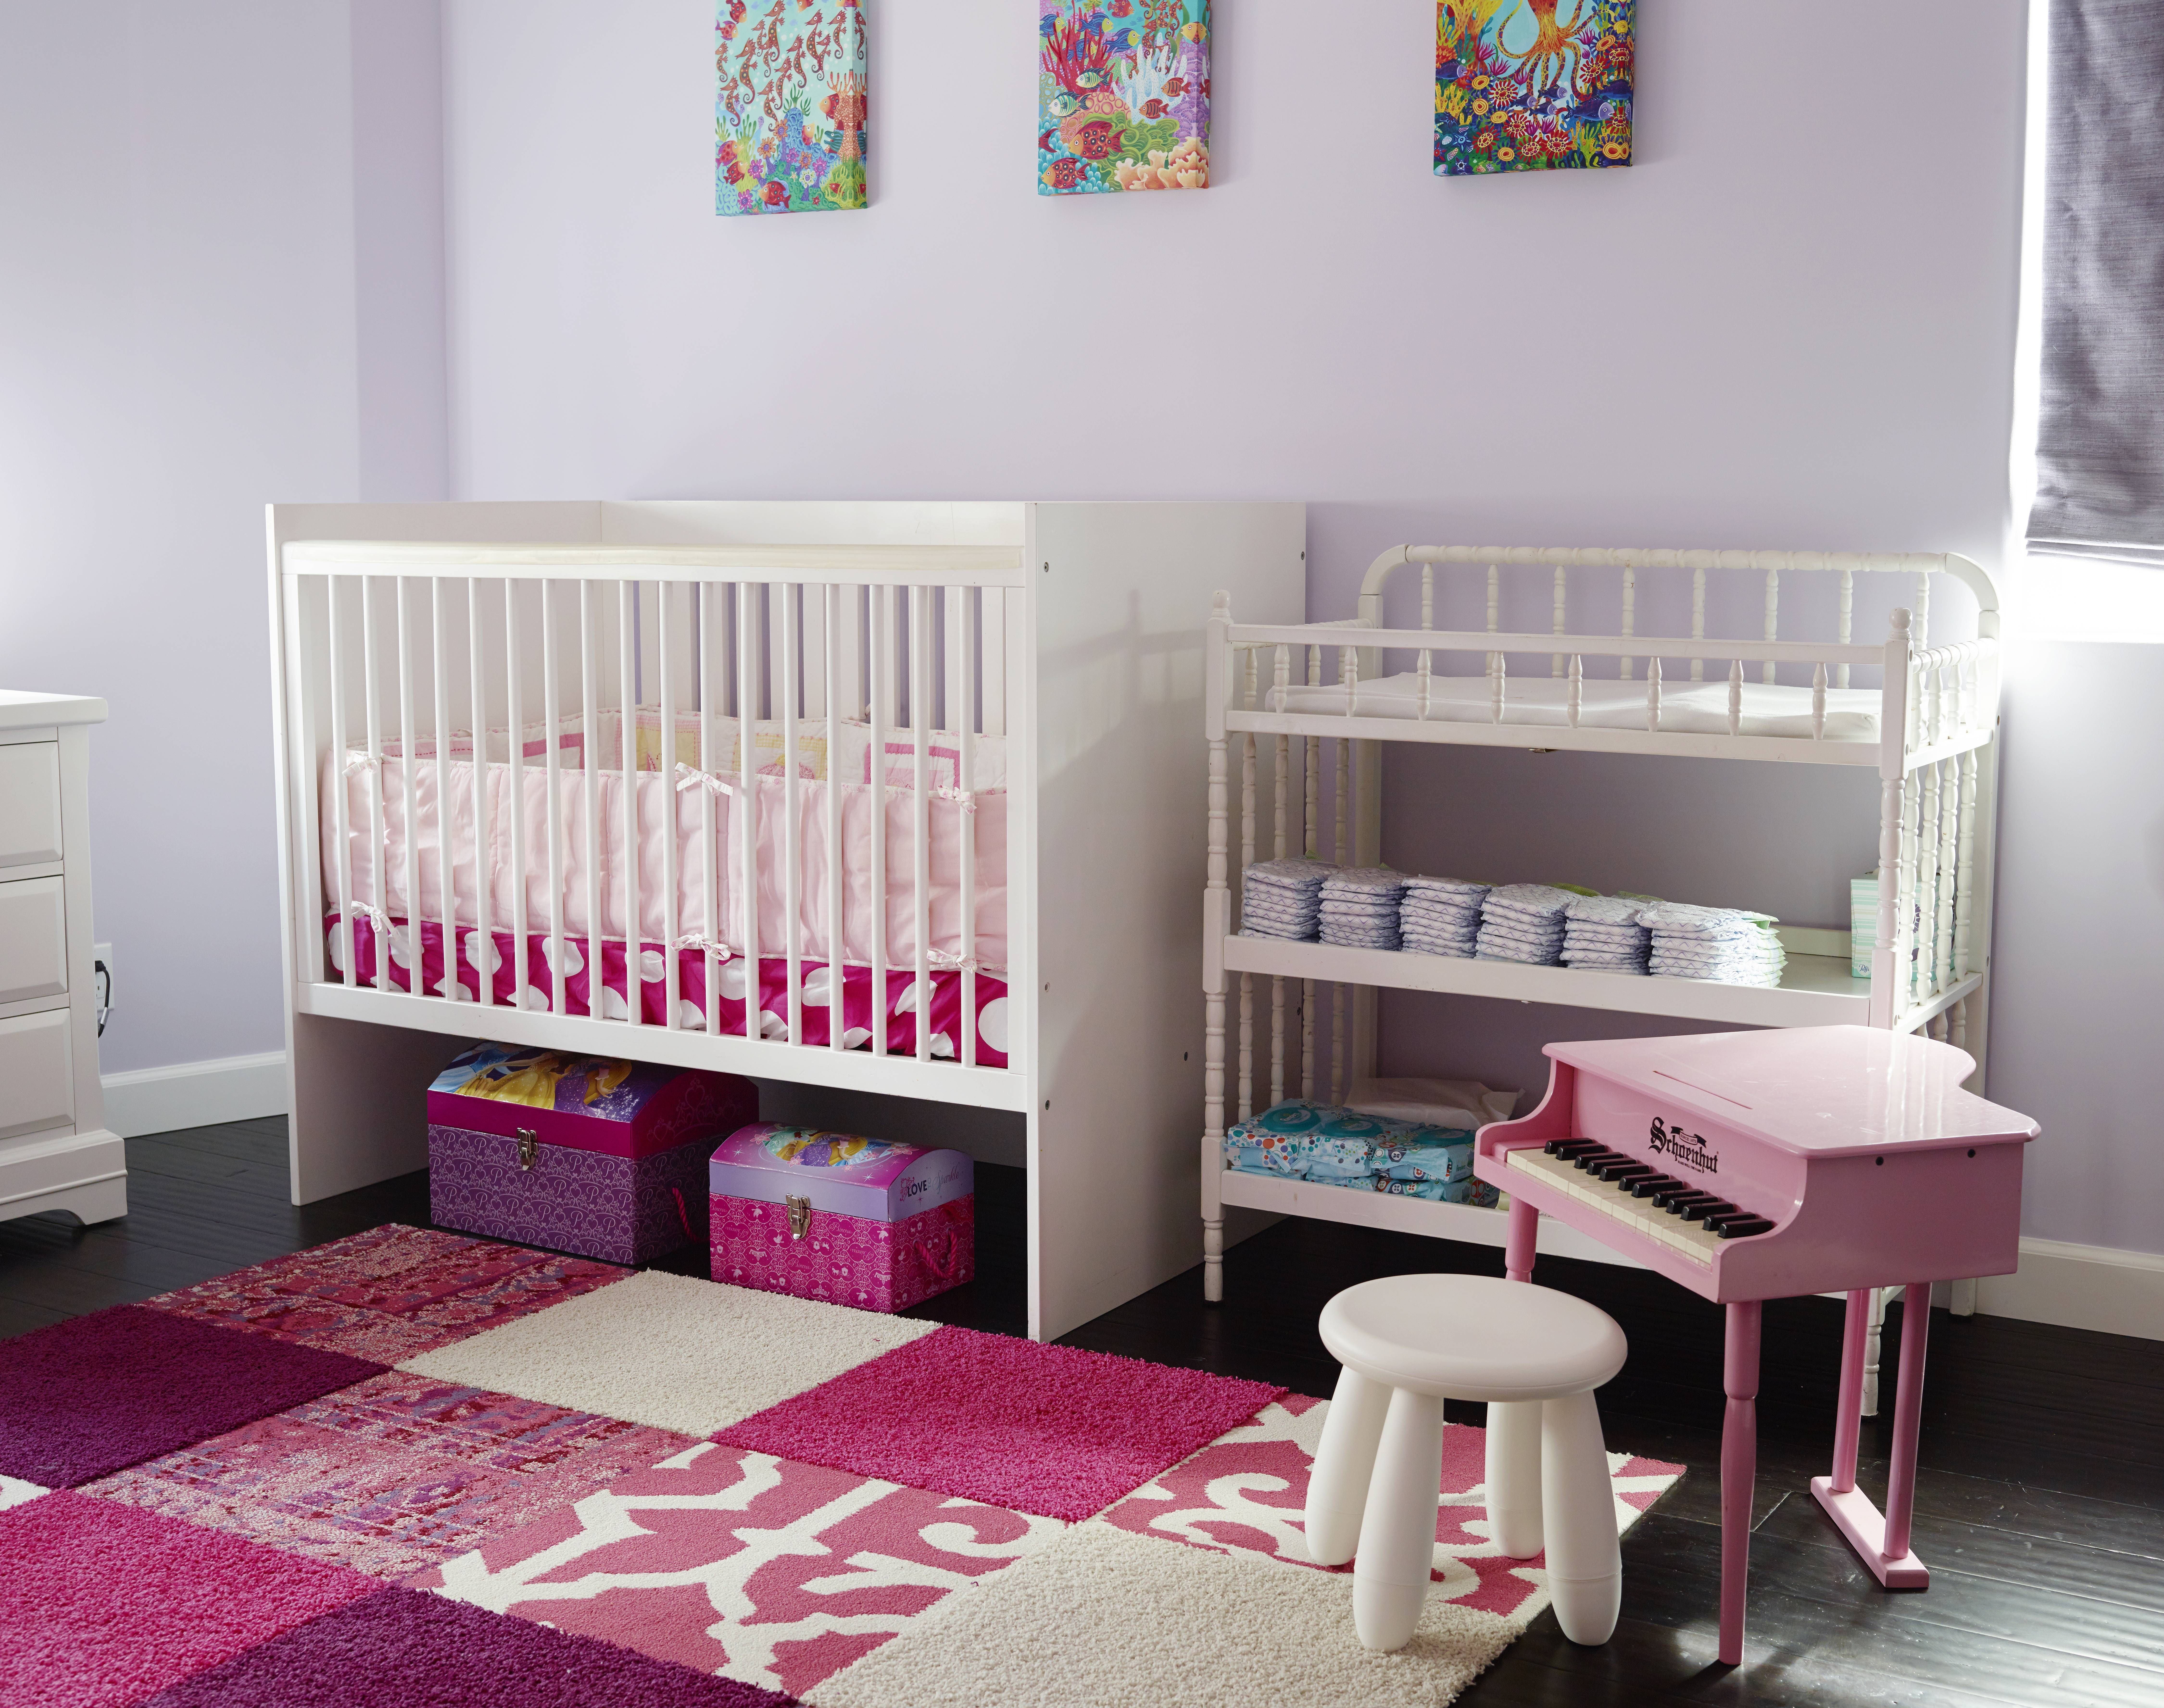 Nursery with FLOR carpet tiles From EcoBungalowLA Robin Wilson